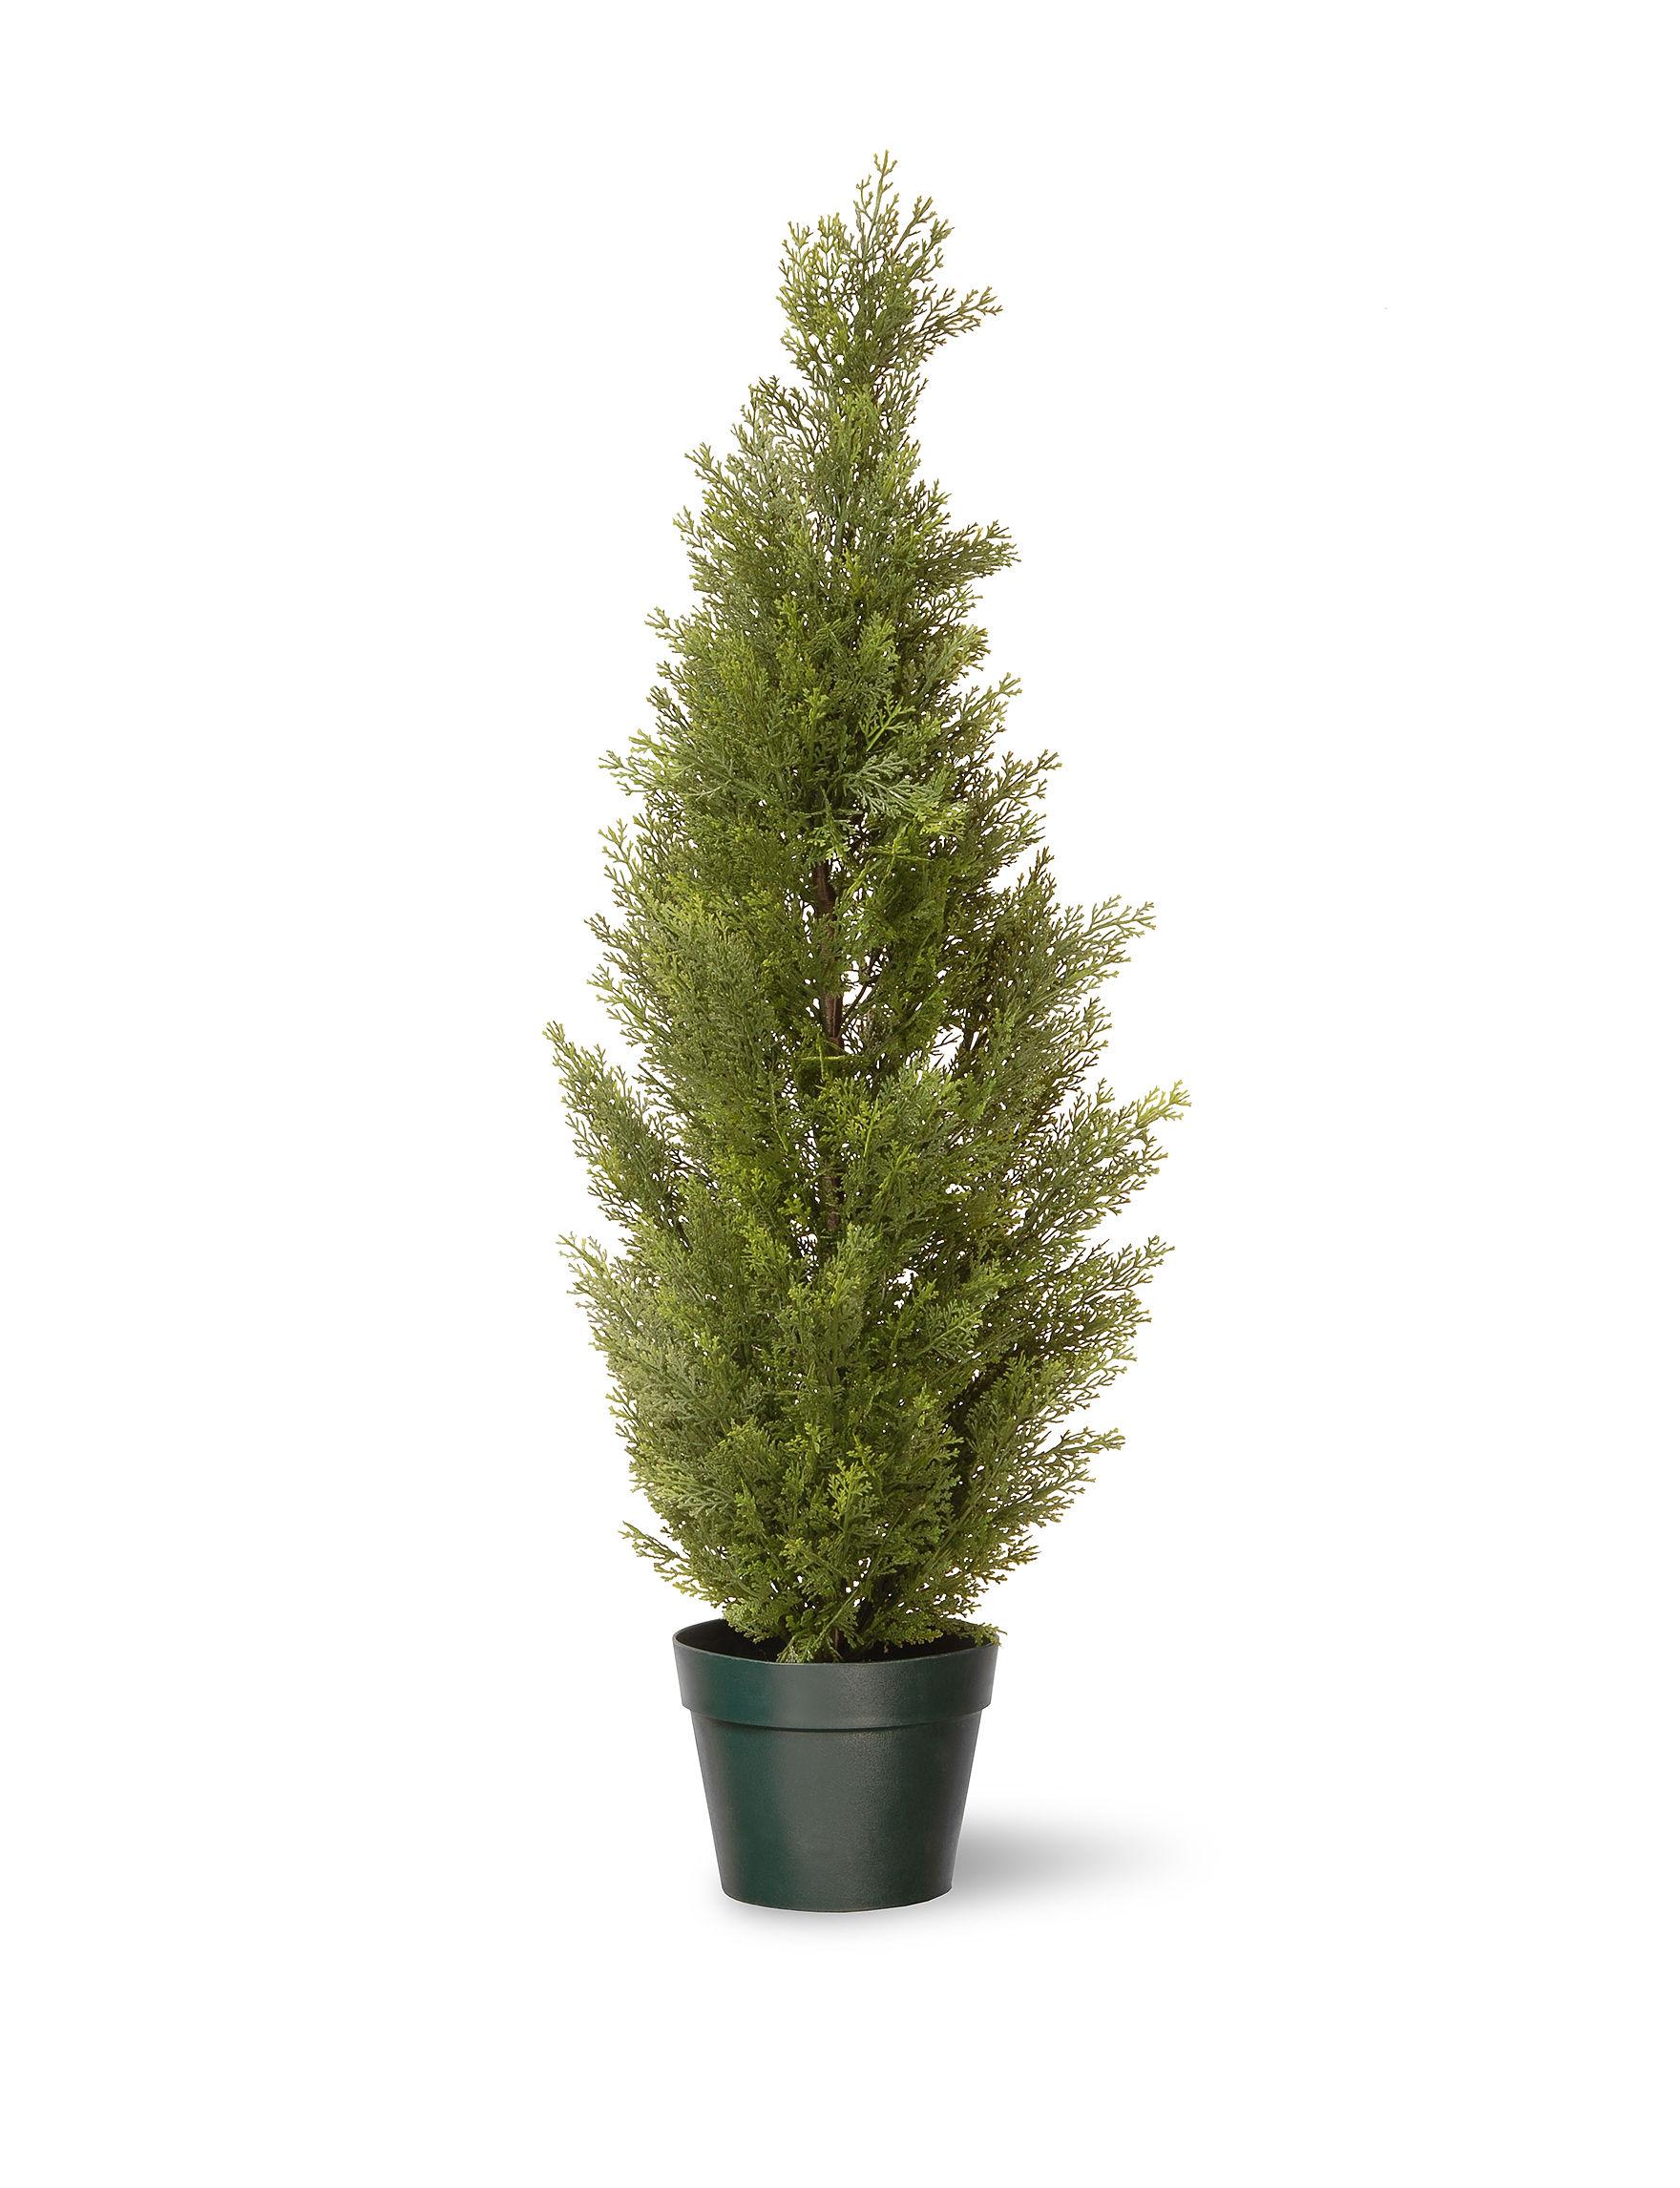 National Tree Company ДУГЛАС в горшочке (литая хвоя РЕ), 122 см, 31EPEDG40/PEDD1-706-40